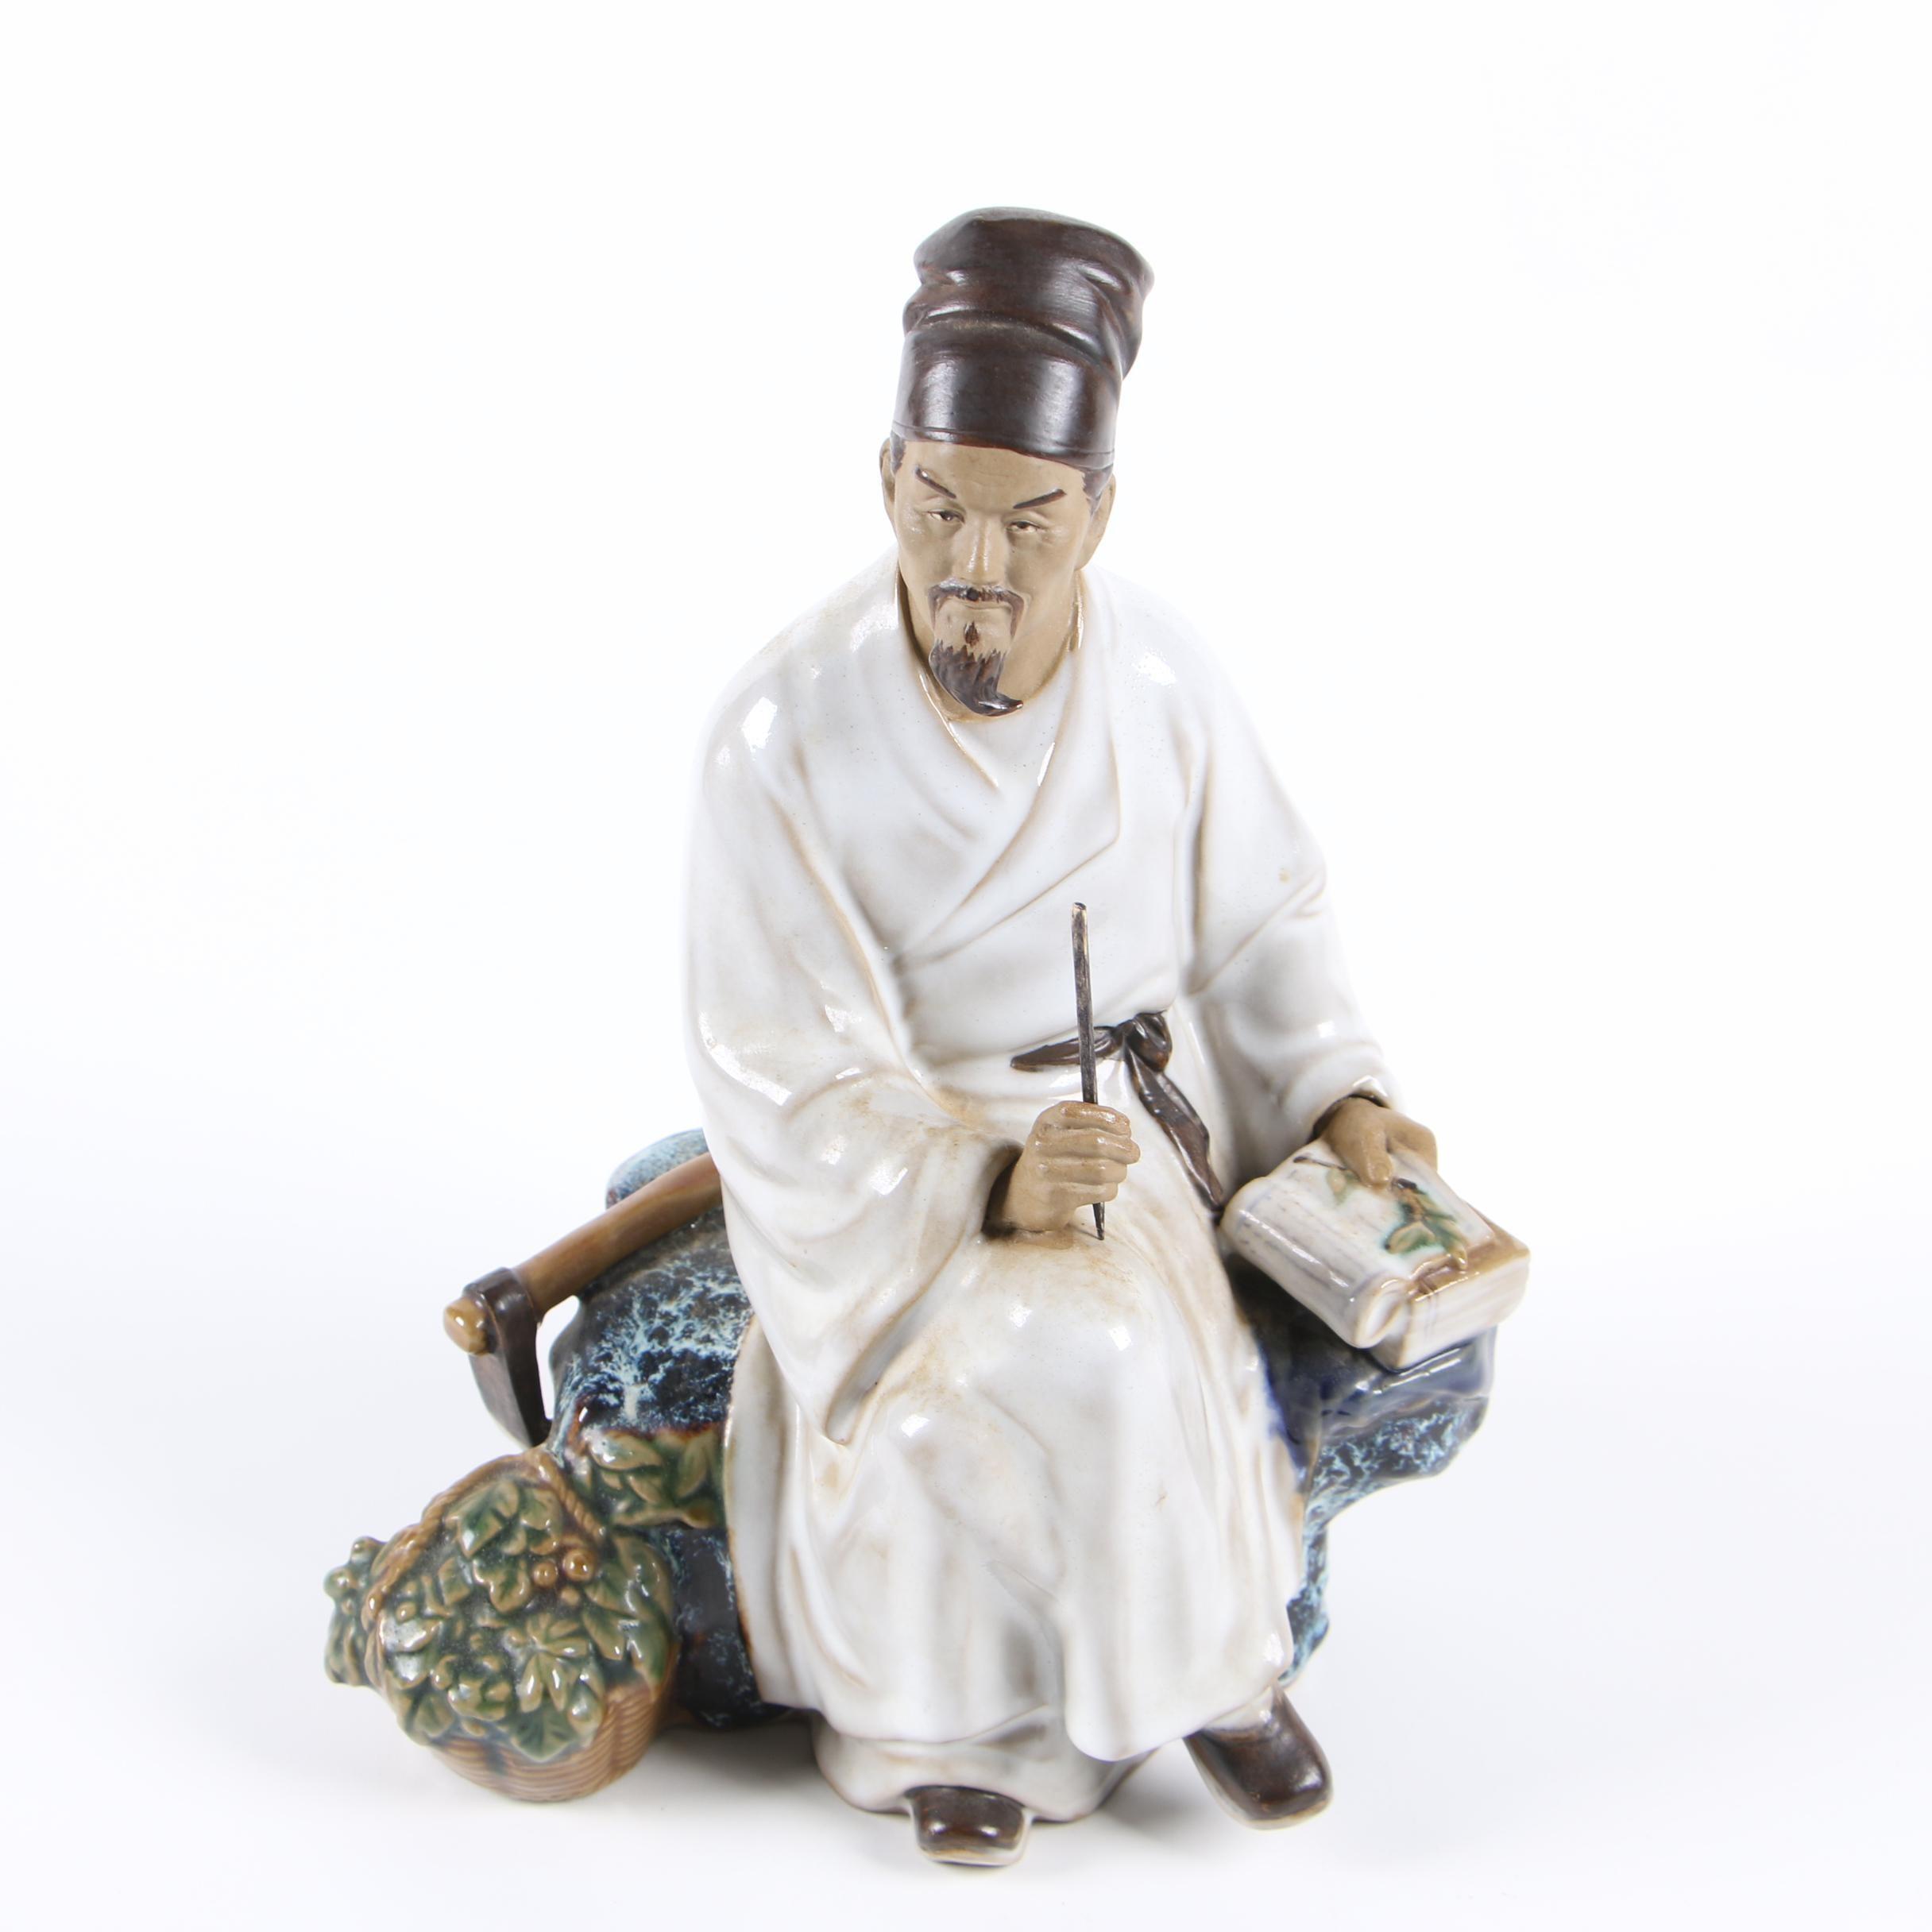 Contemporary Chinese Ceramic Scholar Figurine